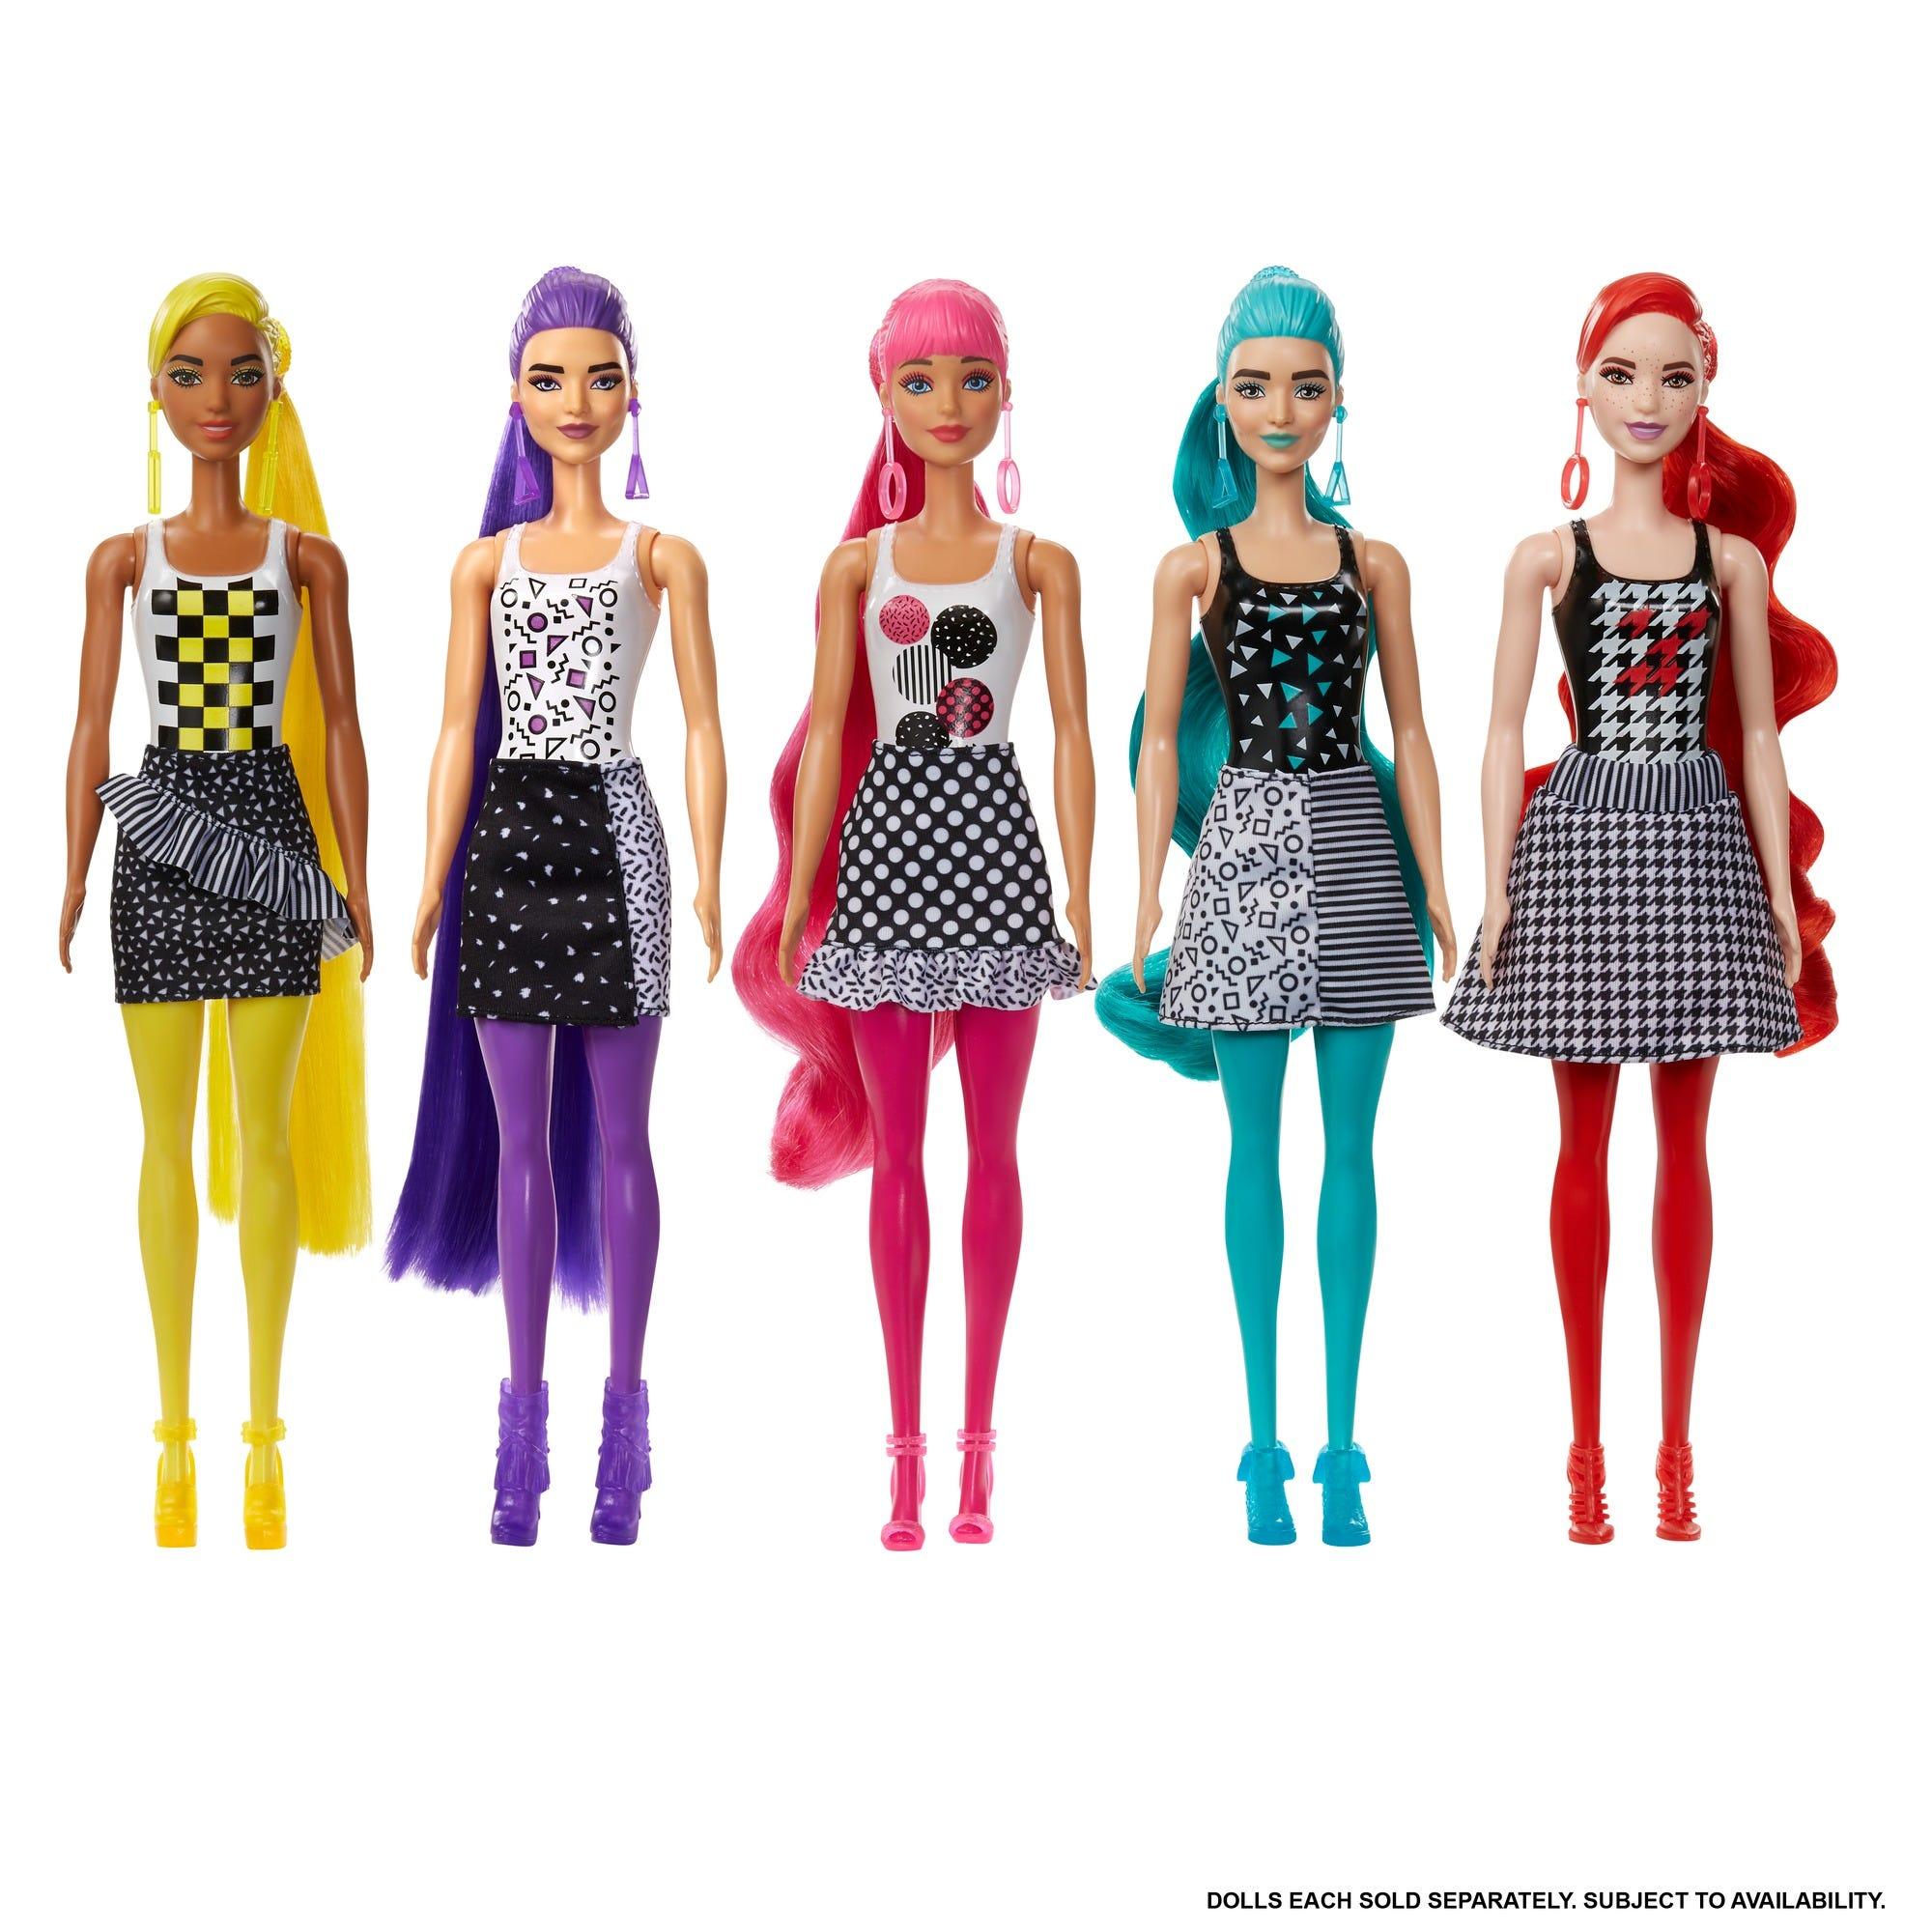 Barbie Monochrome Series Barbie Doll Assortment